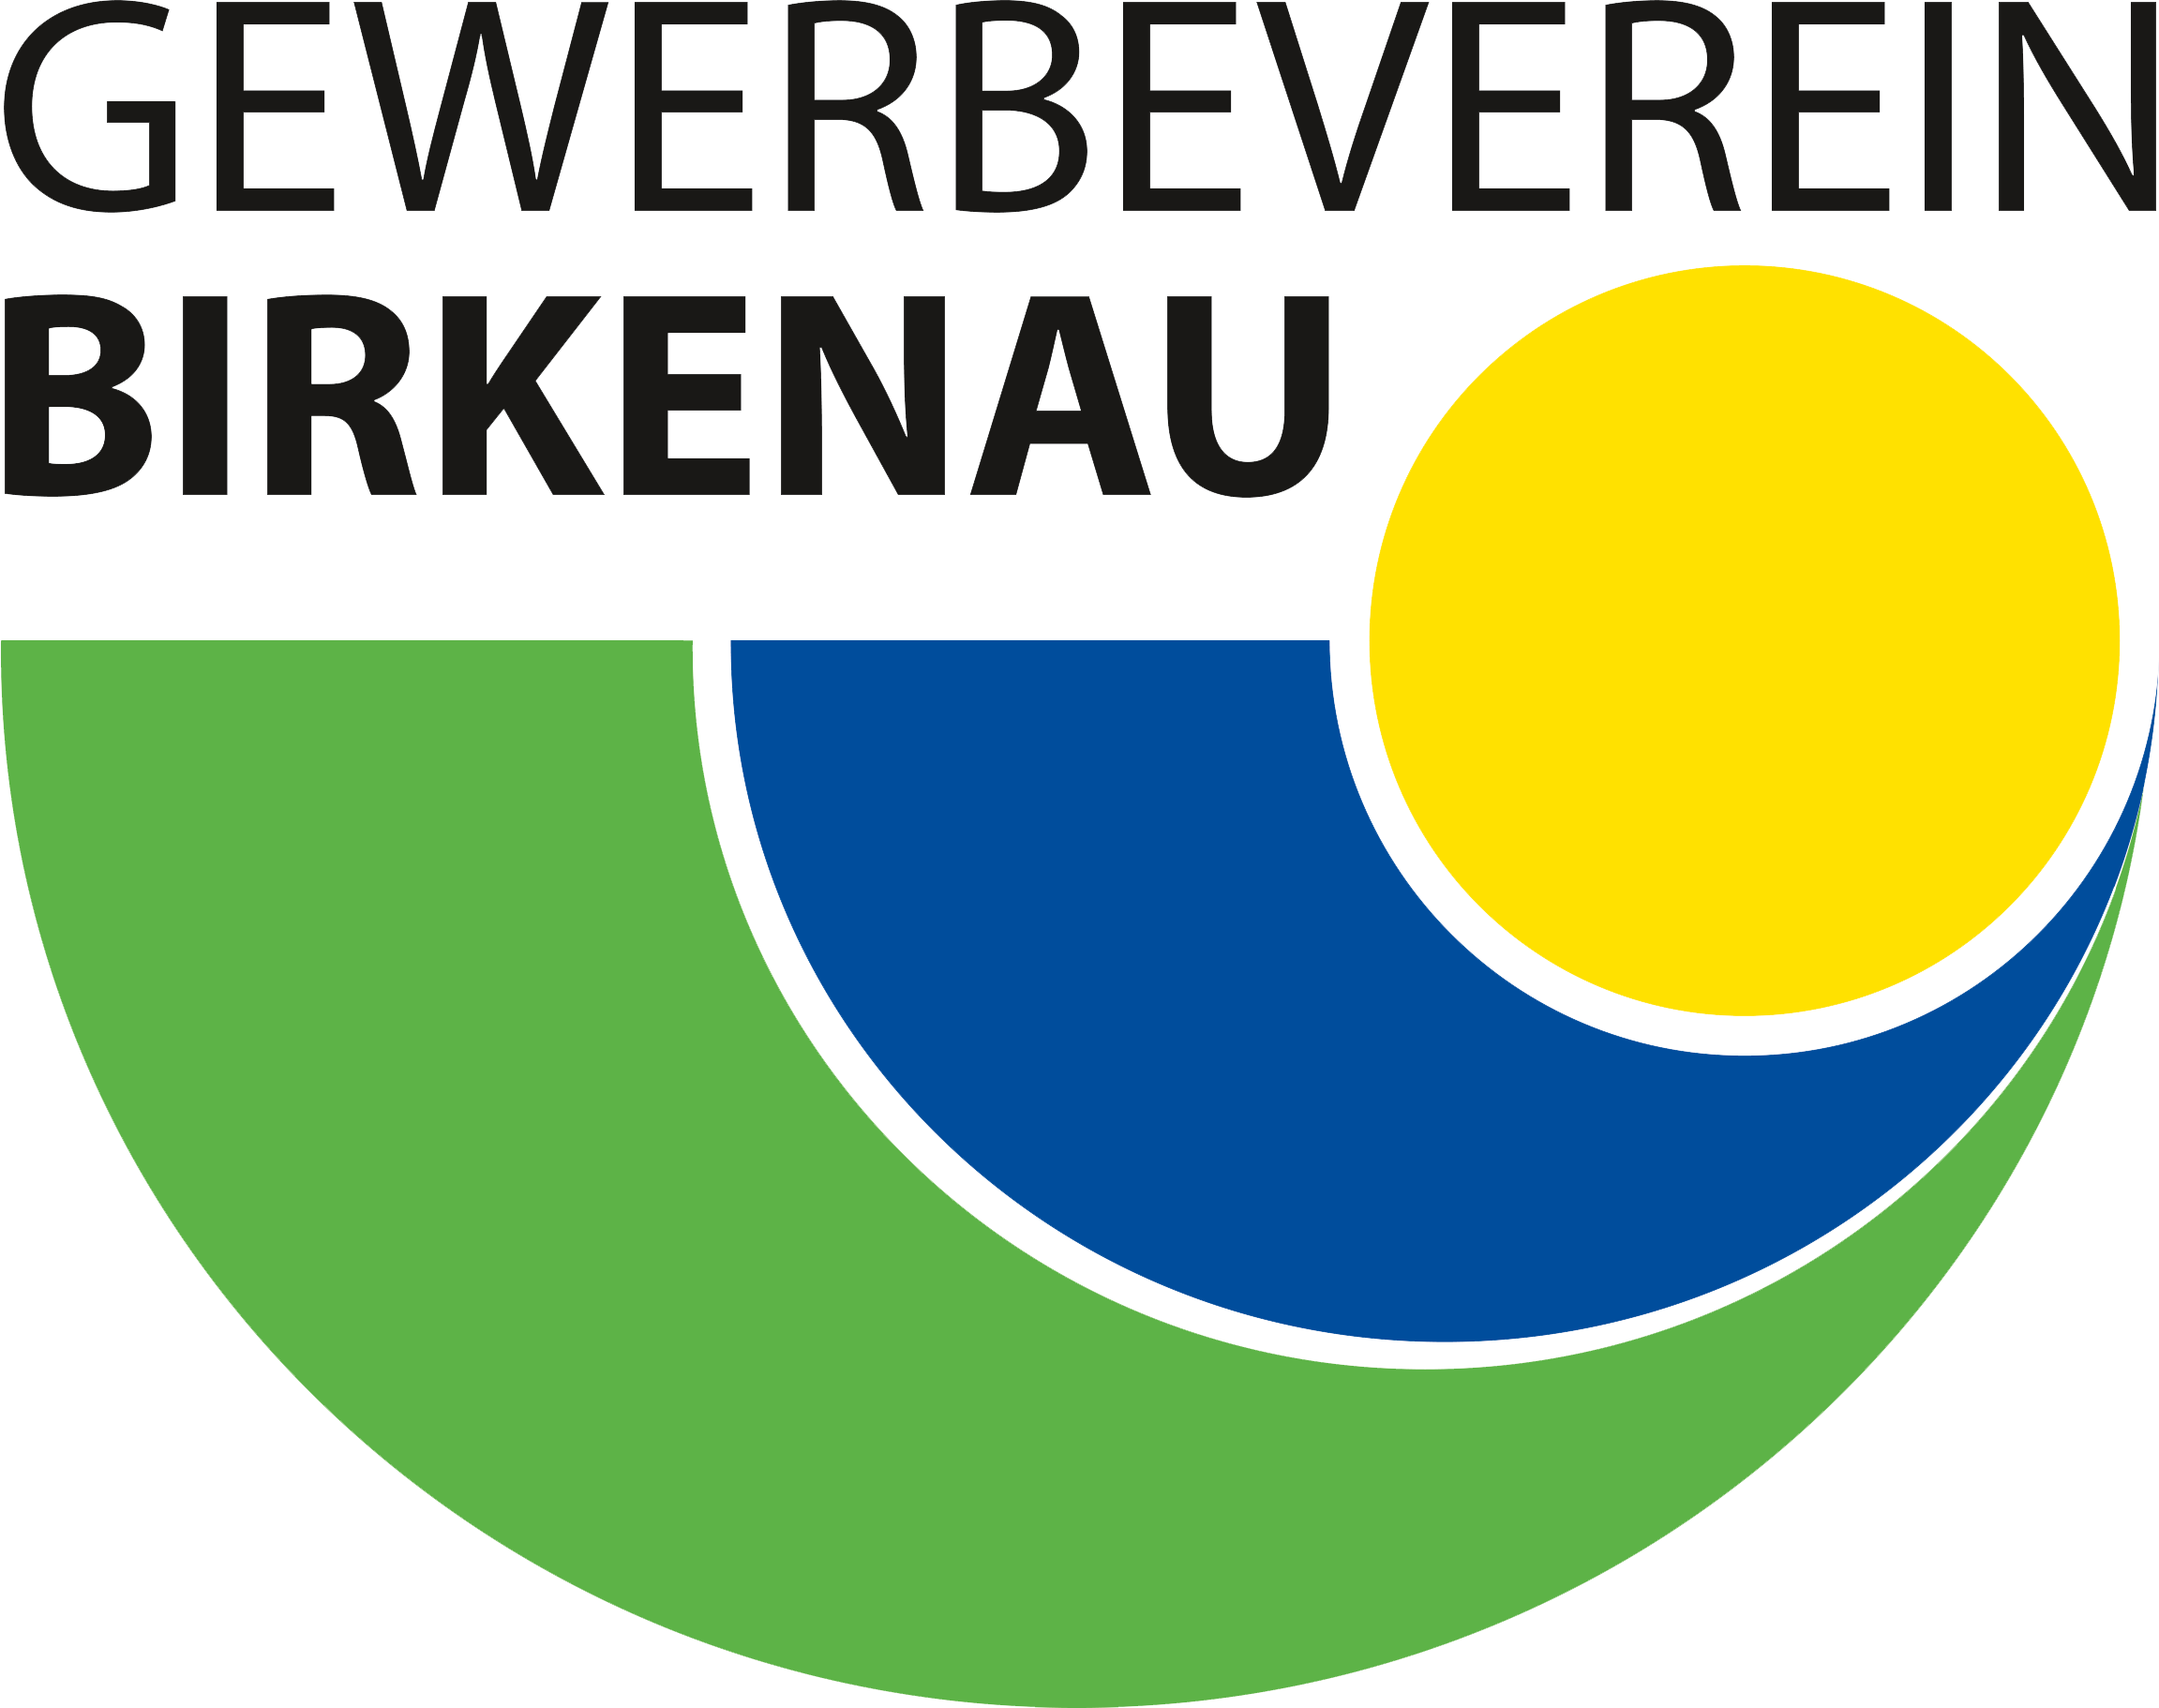 Gewerbeverein Birkenau e.V.